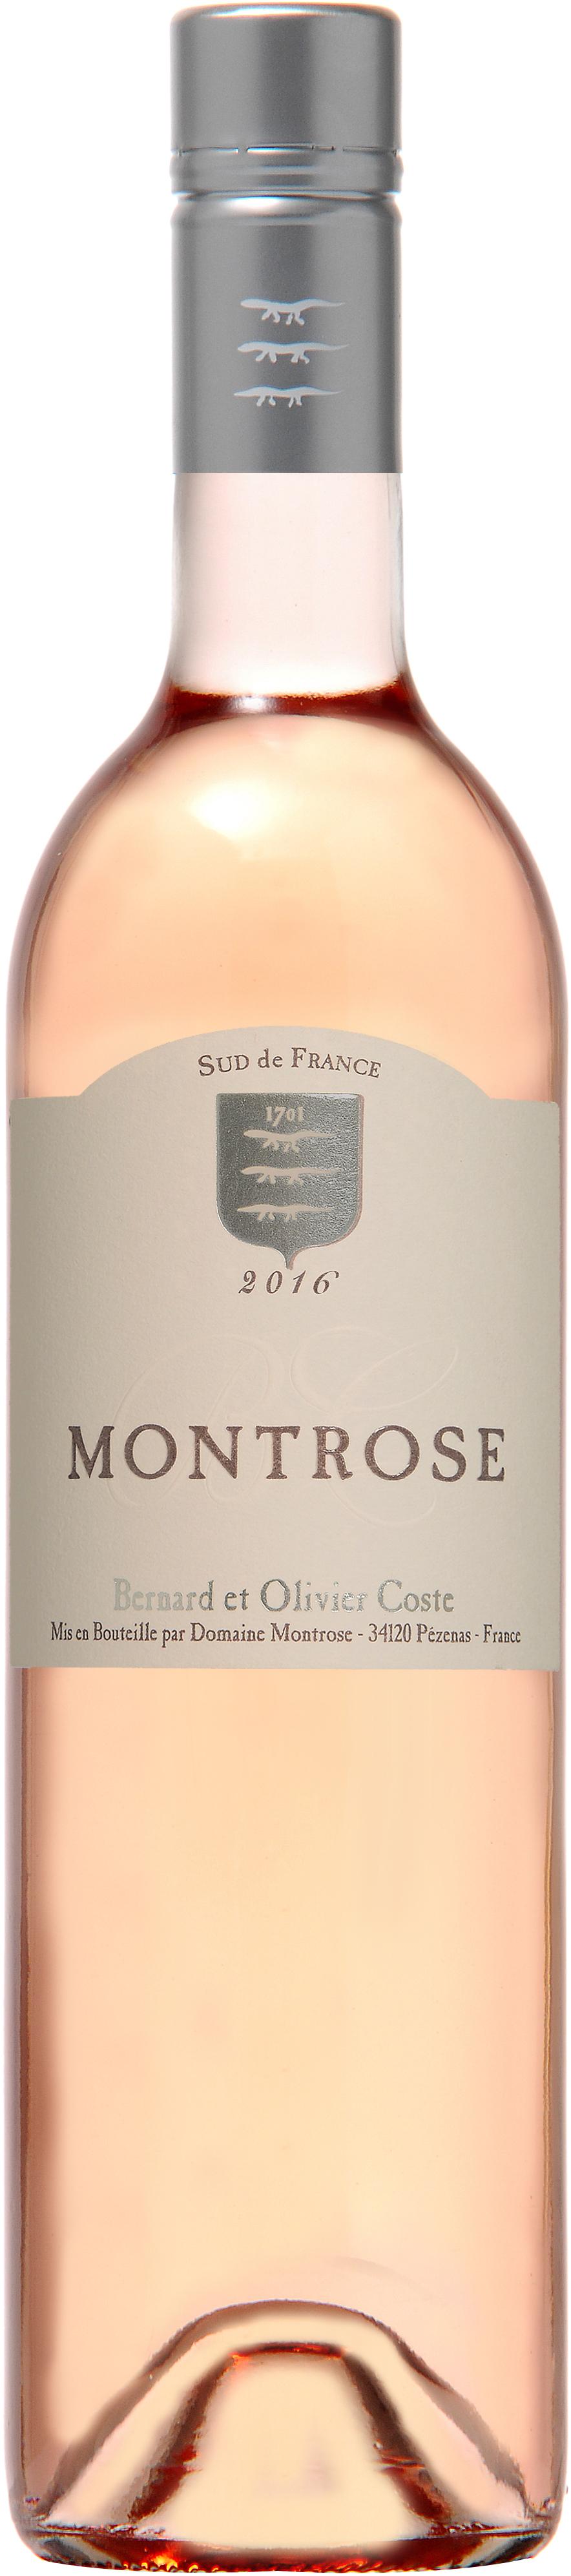 Montrose Rosé 2016.jpg